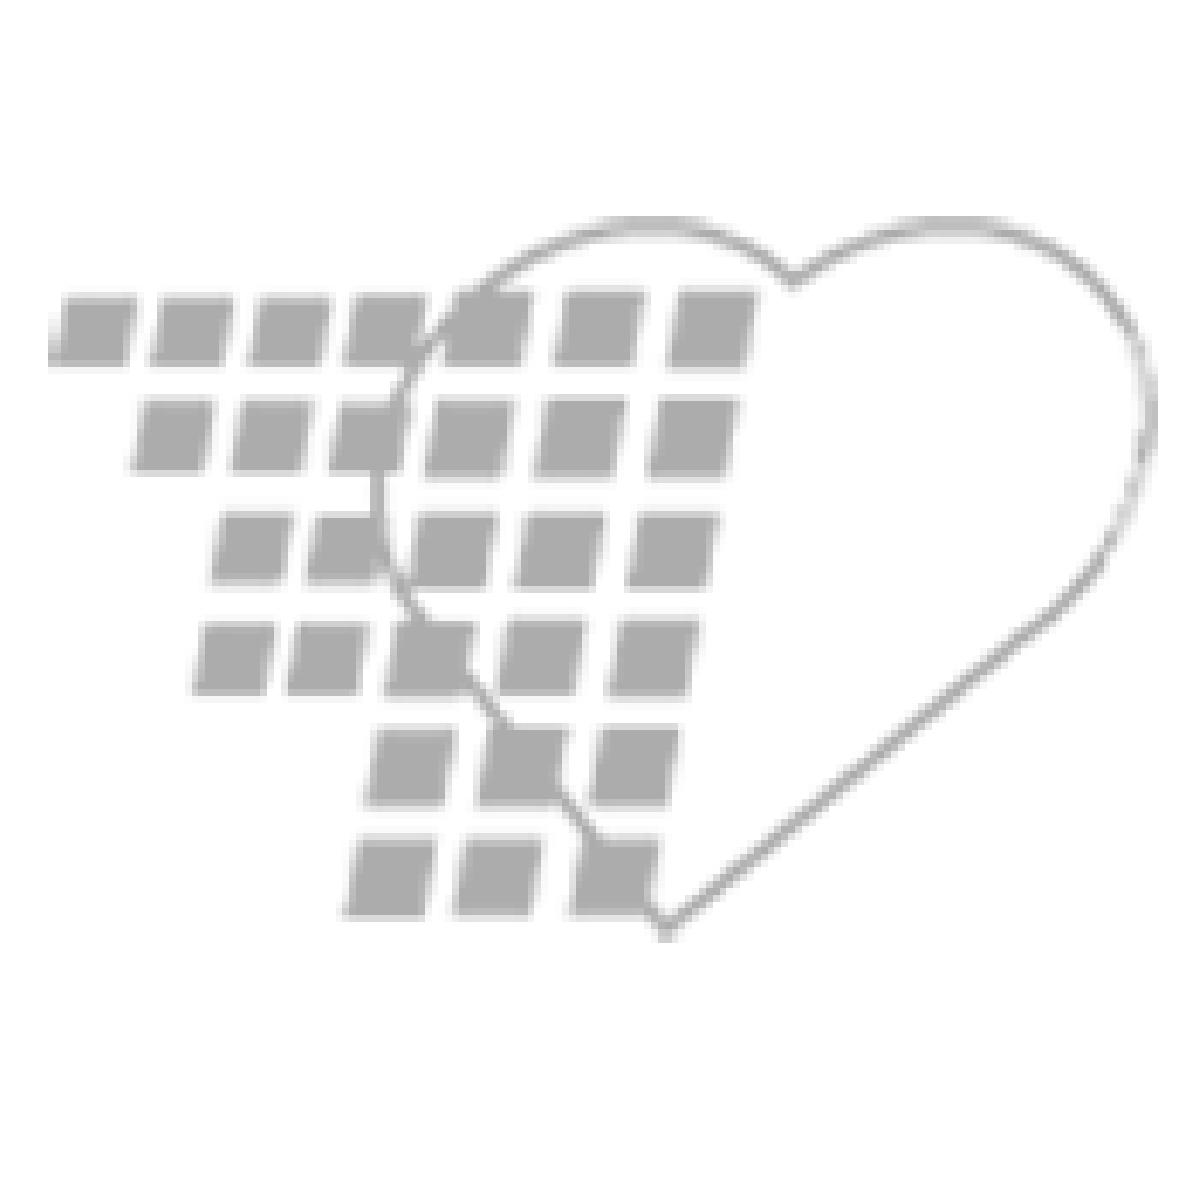 06-54-0566 - BARD StatLock® IV Ultra Stabilization Device